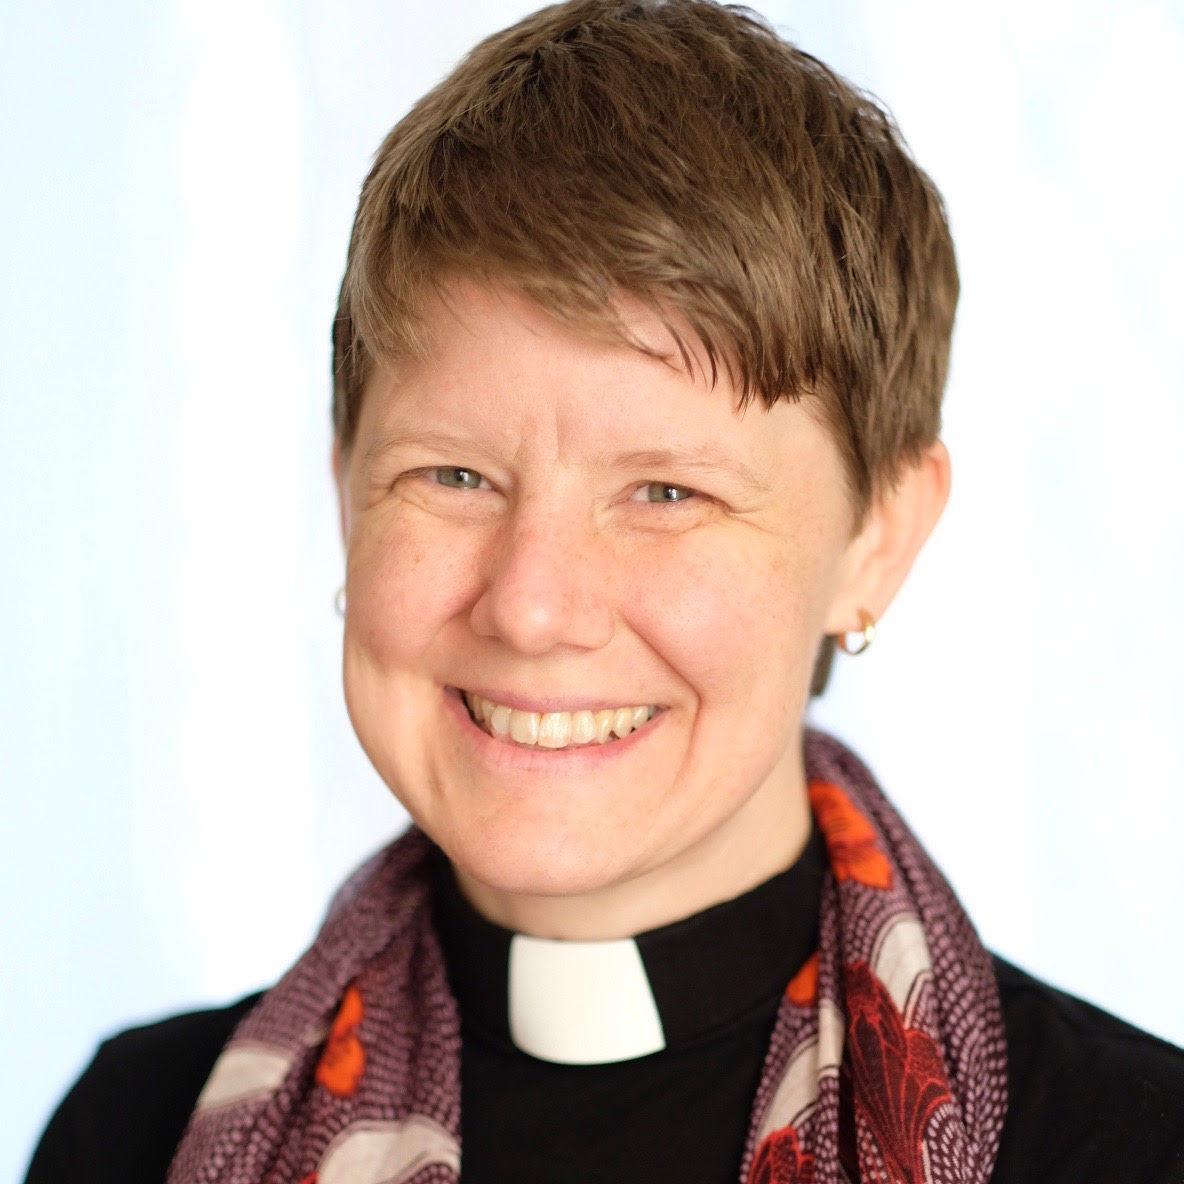 The Rev. Heidi Haverkamp